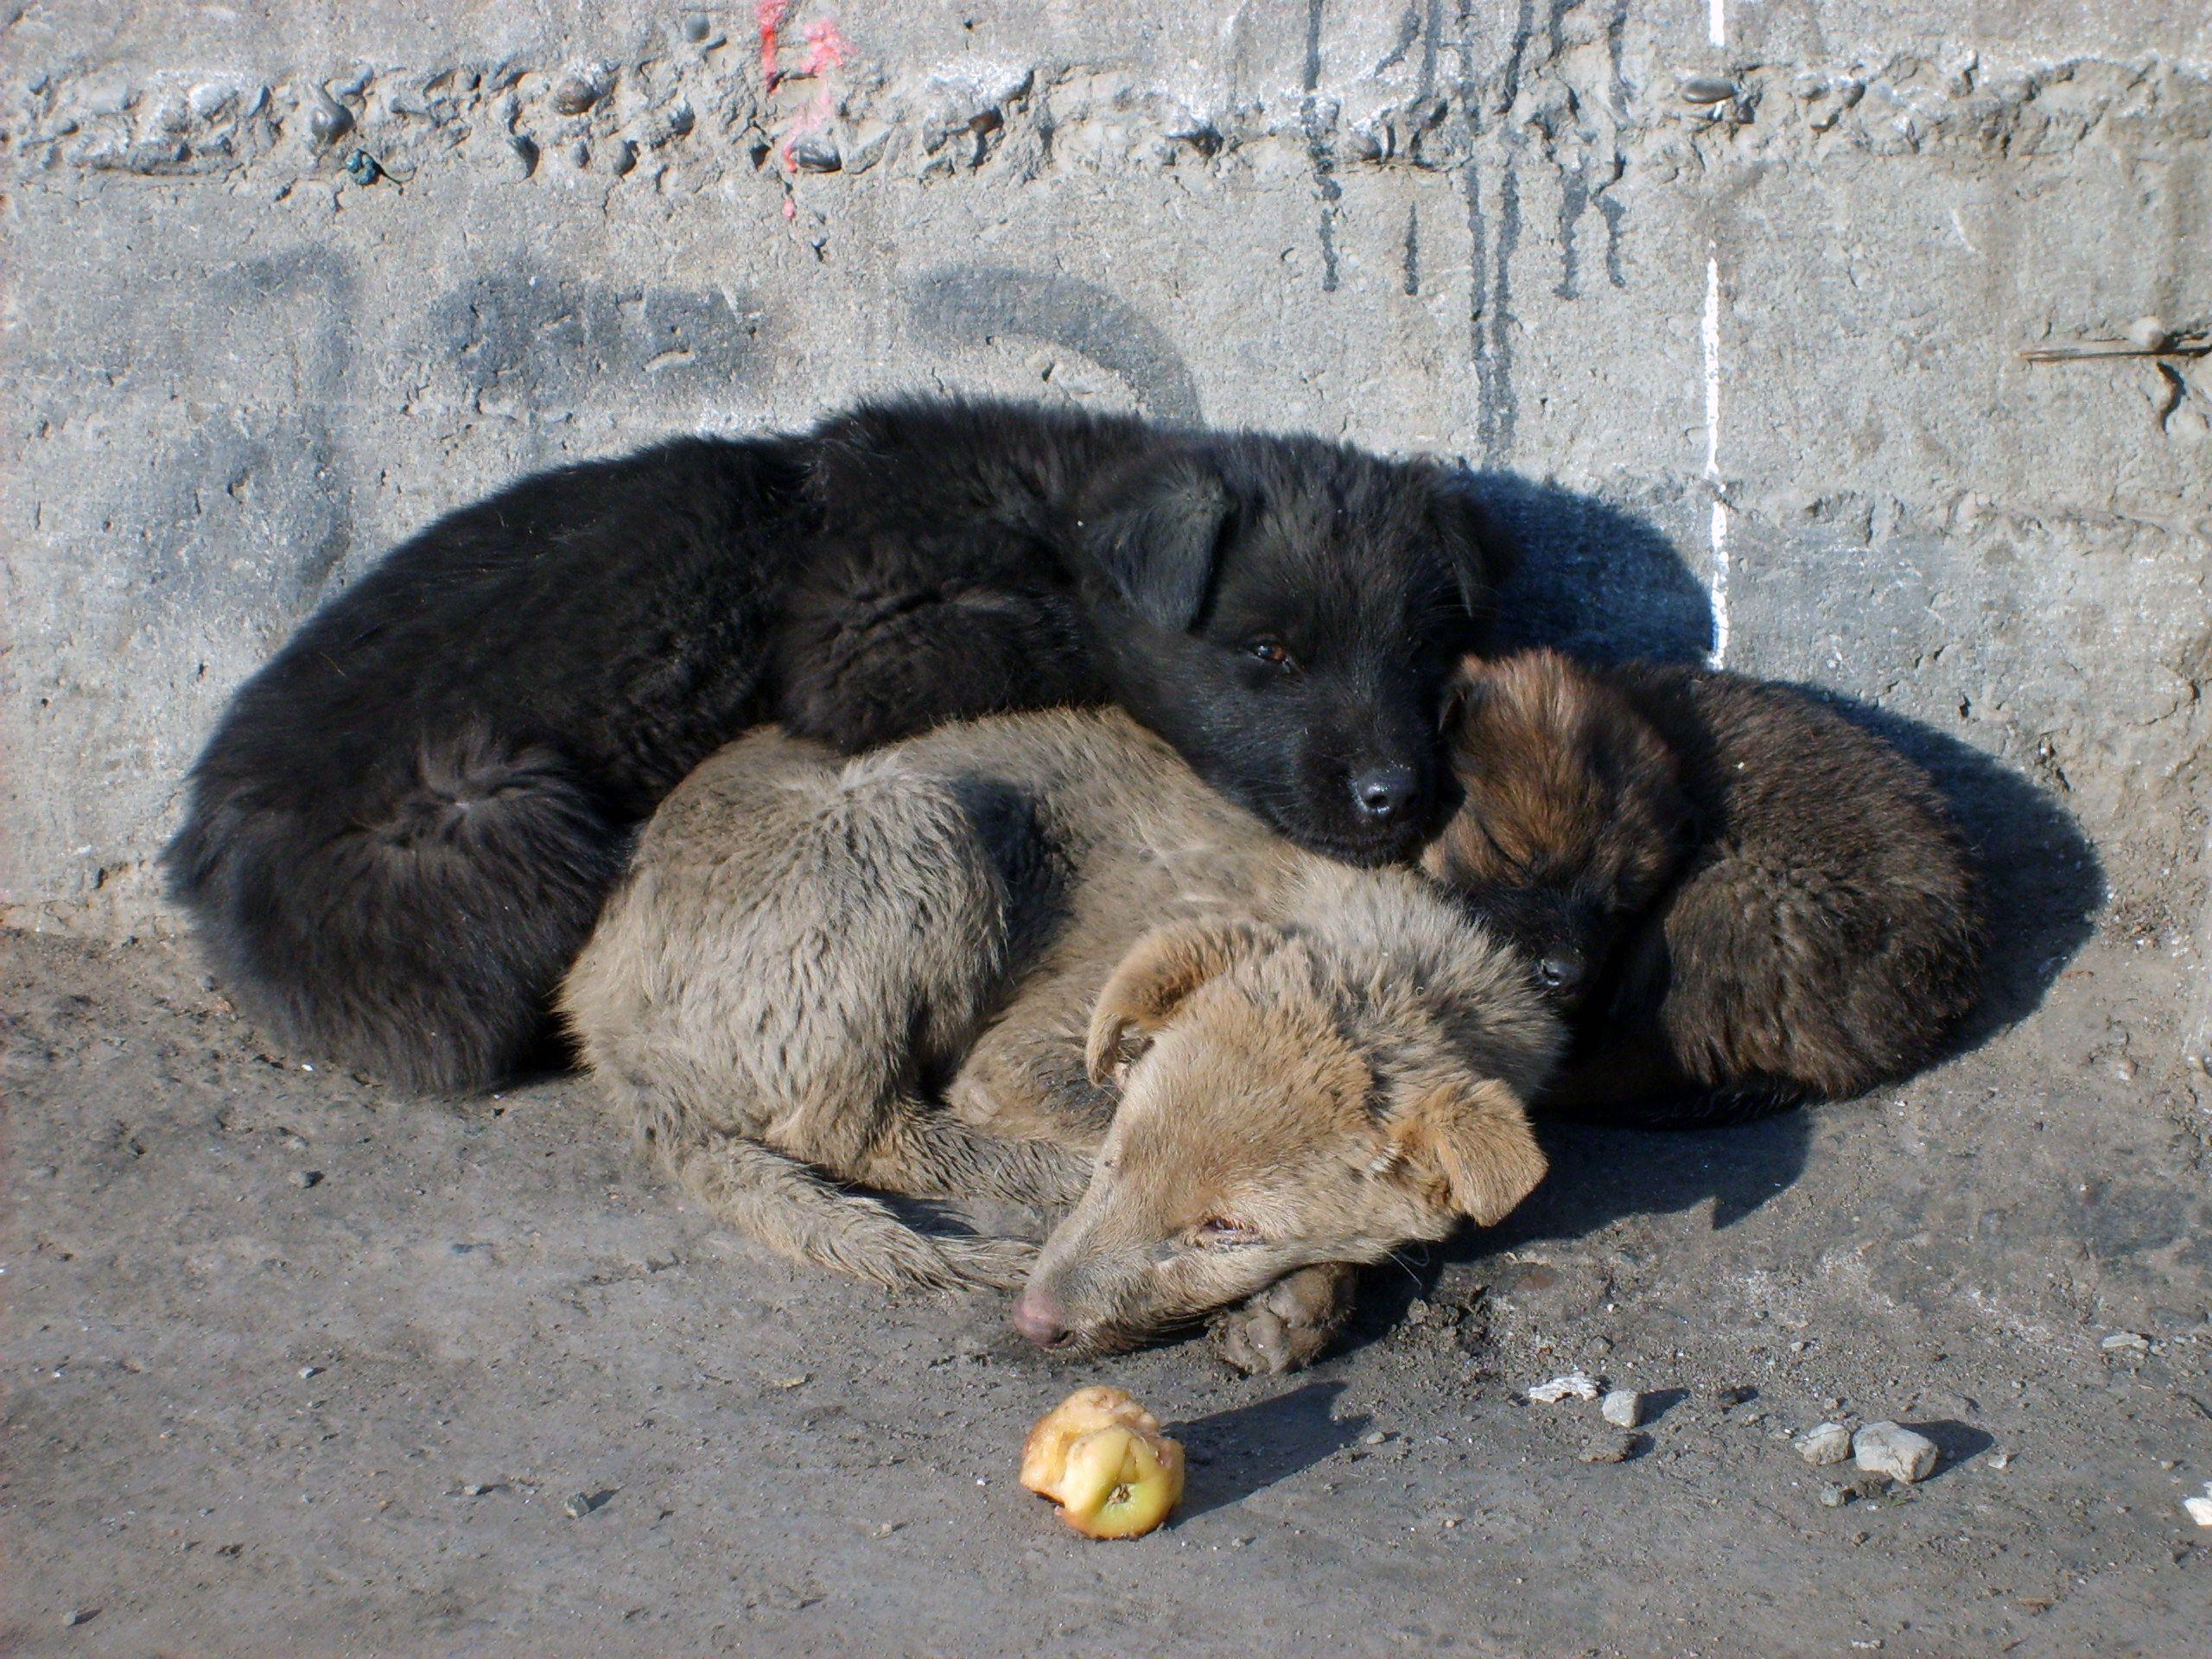 free image: sleeping puppies | libreshot public domain photos